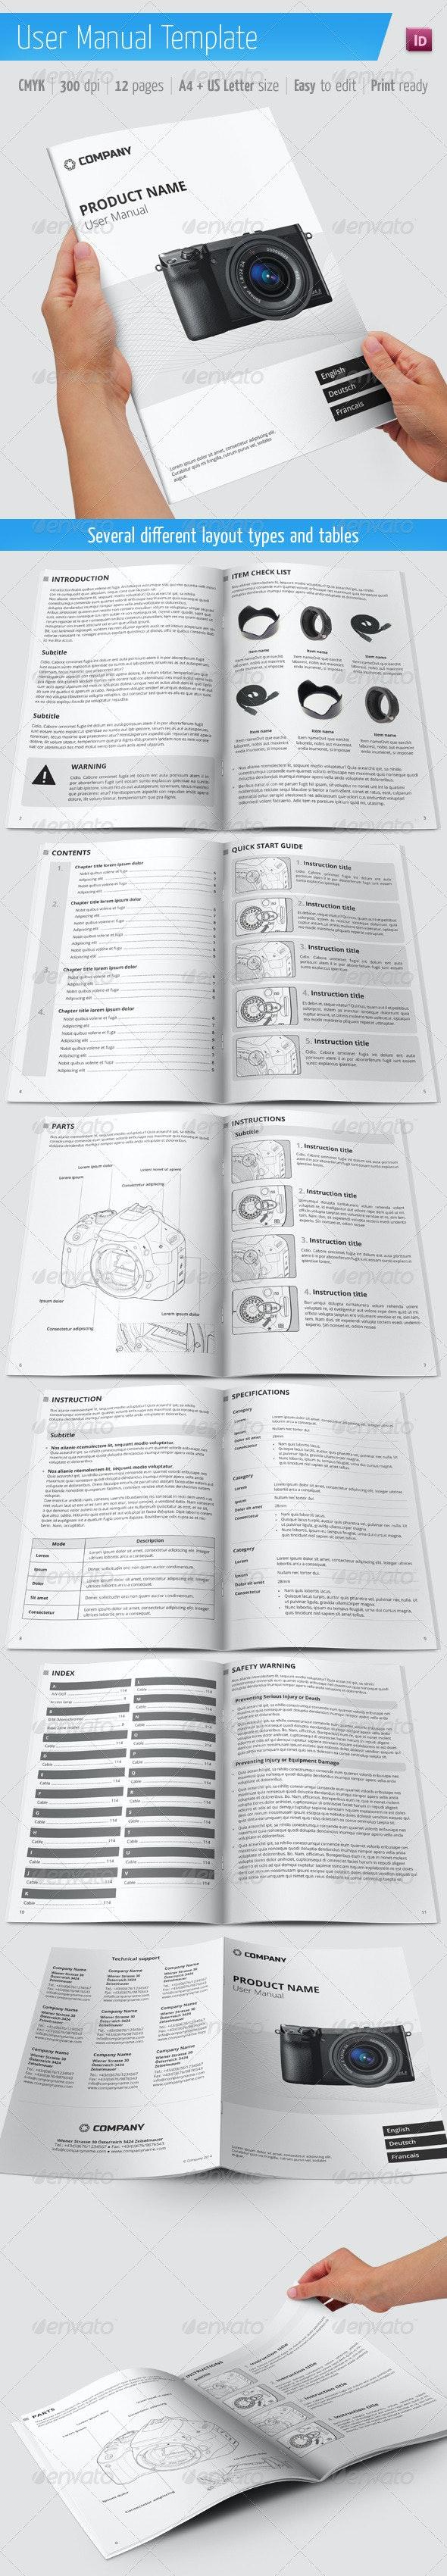 User Manual Template - Informational Brochures